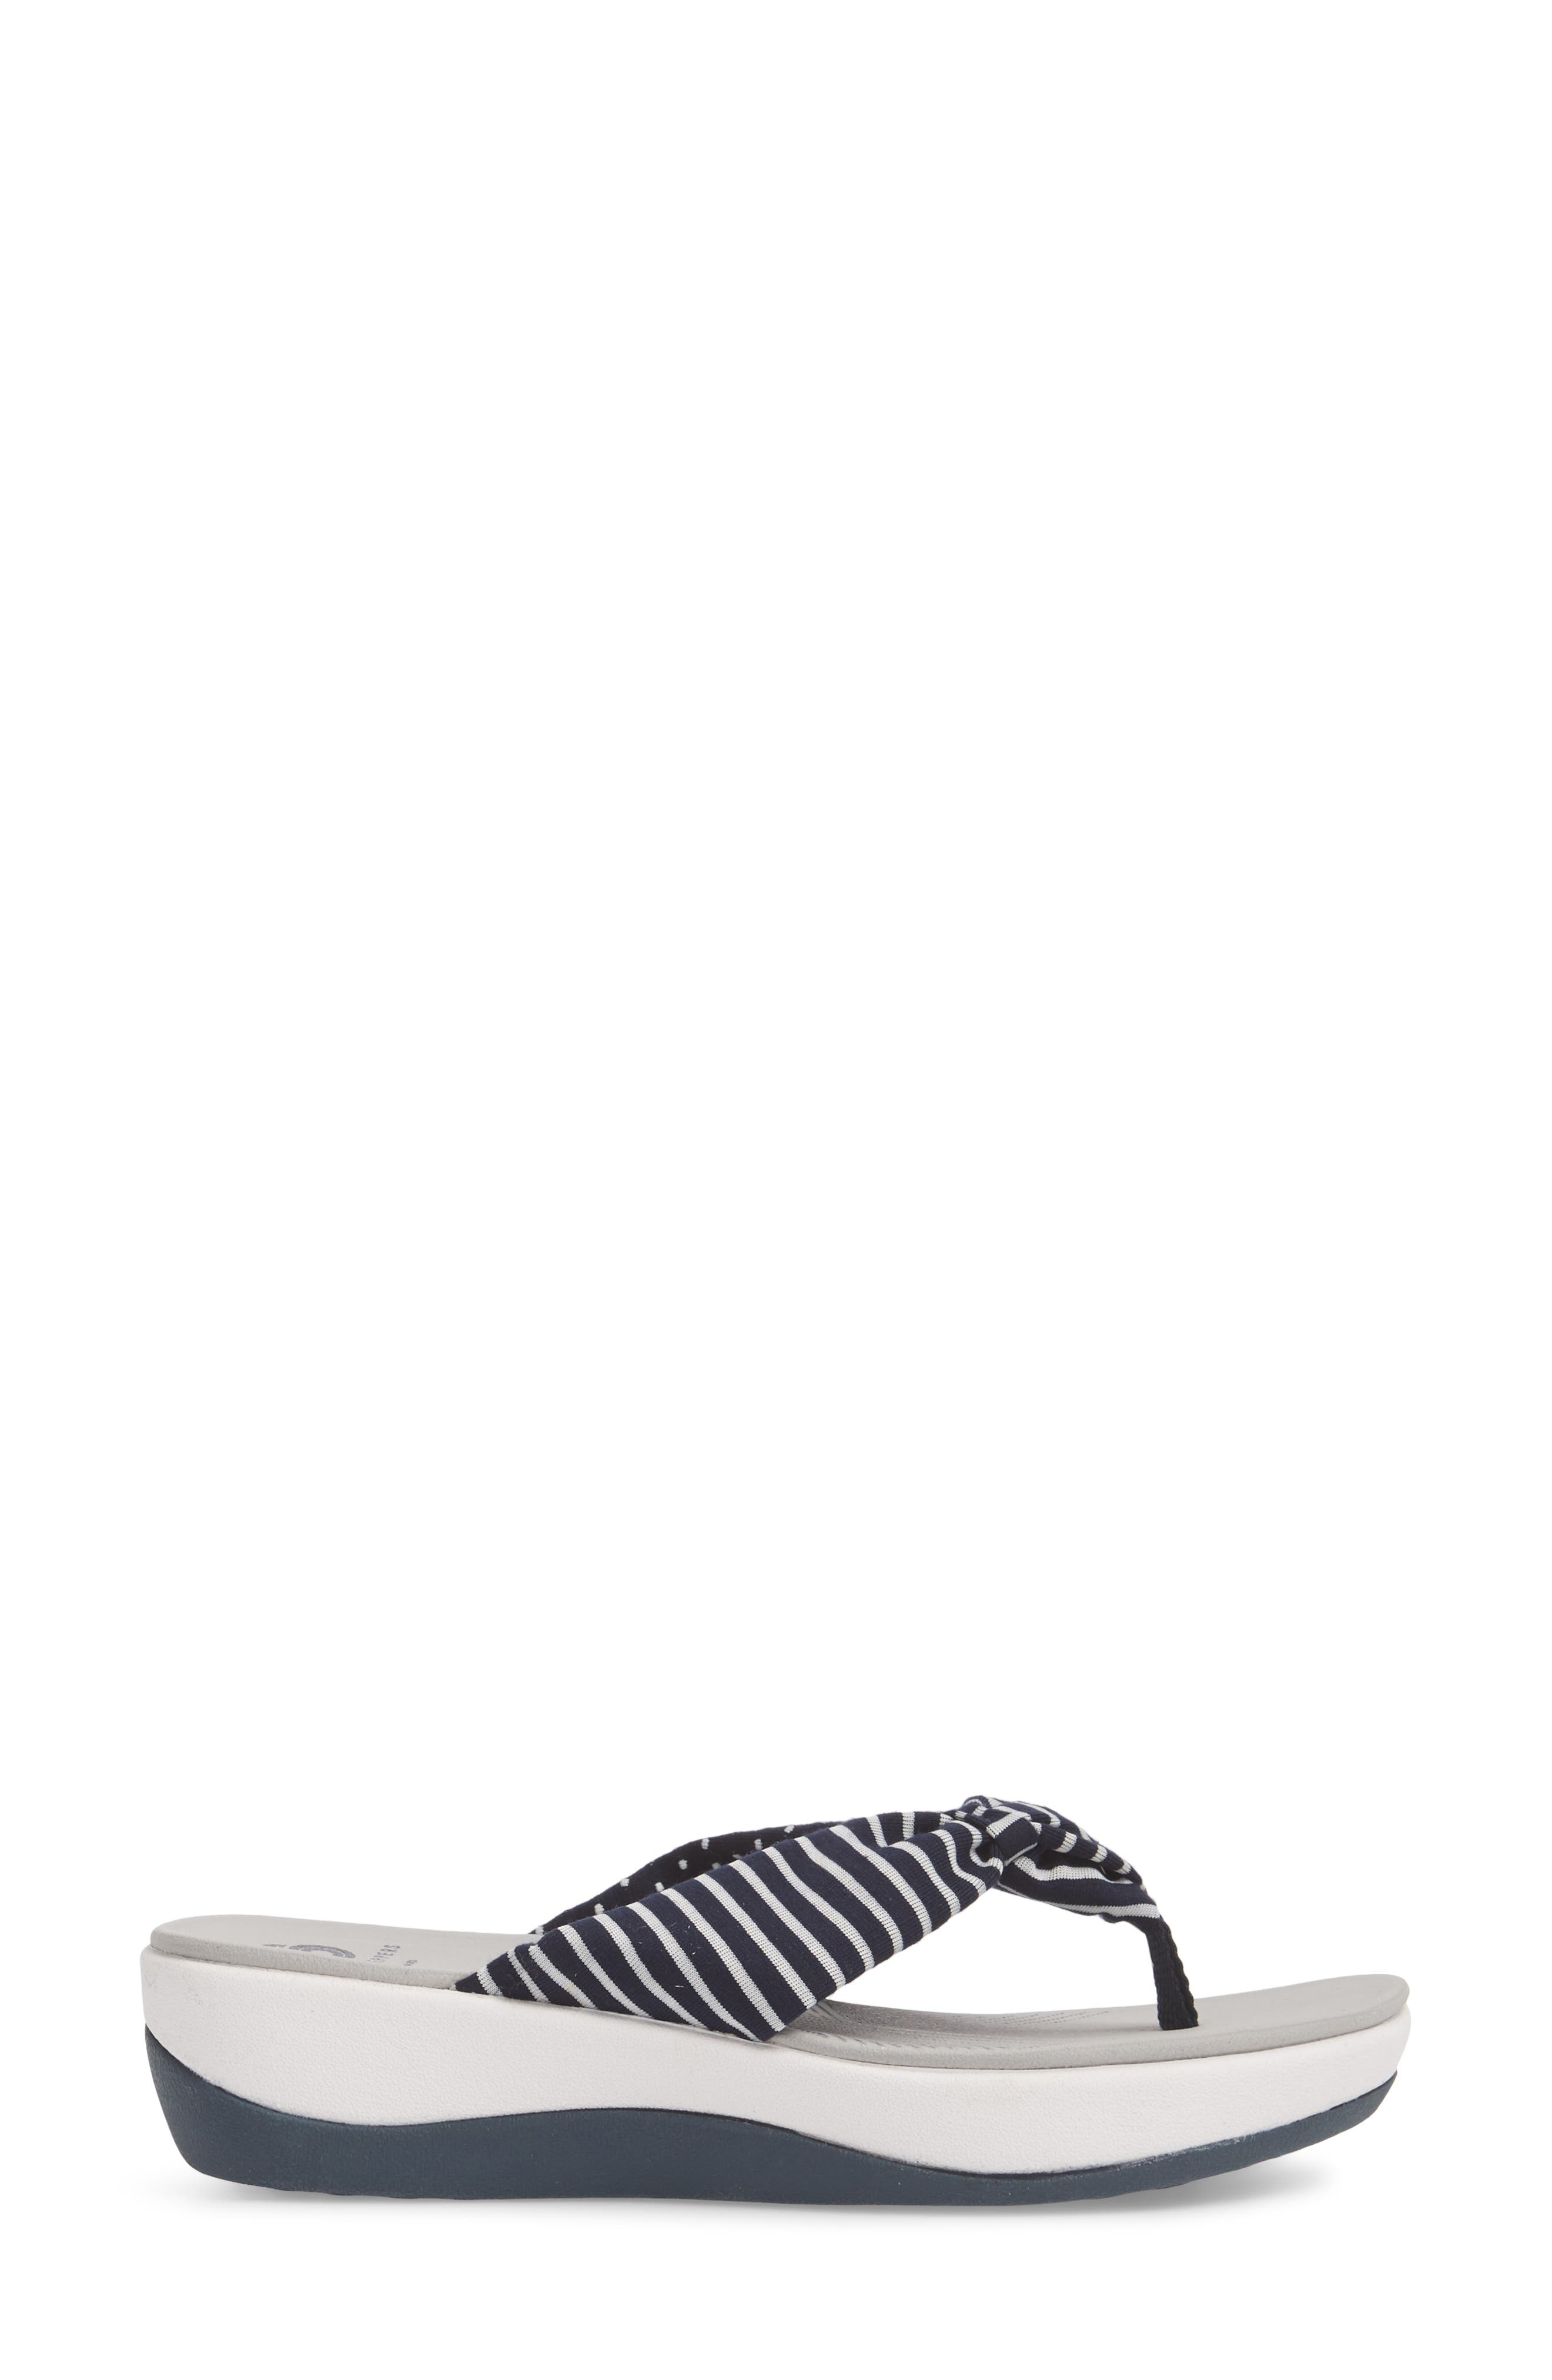 Arla Glison Flip Flop,                             Alternate thumbnail 3, color,                             Navy Fabric